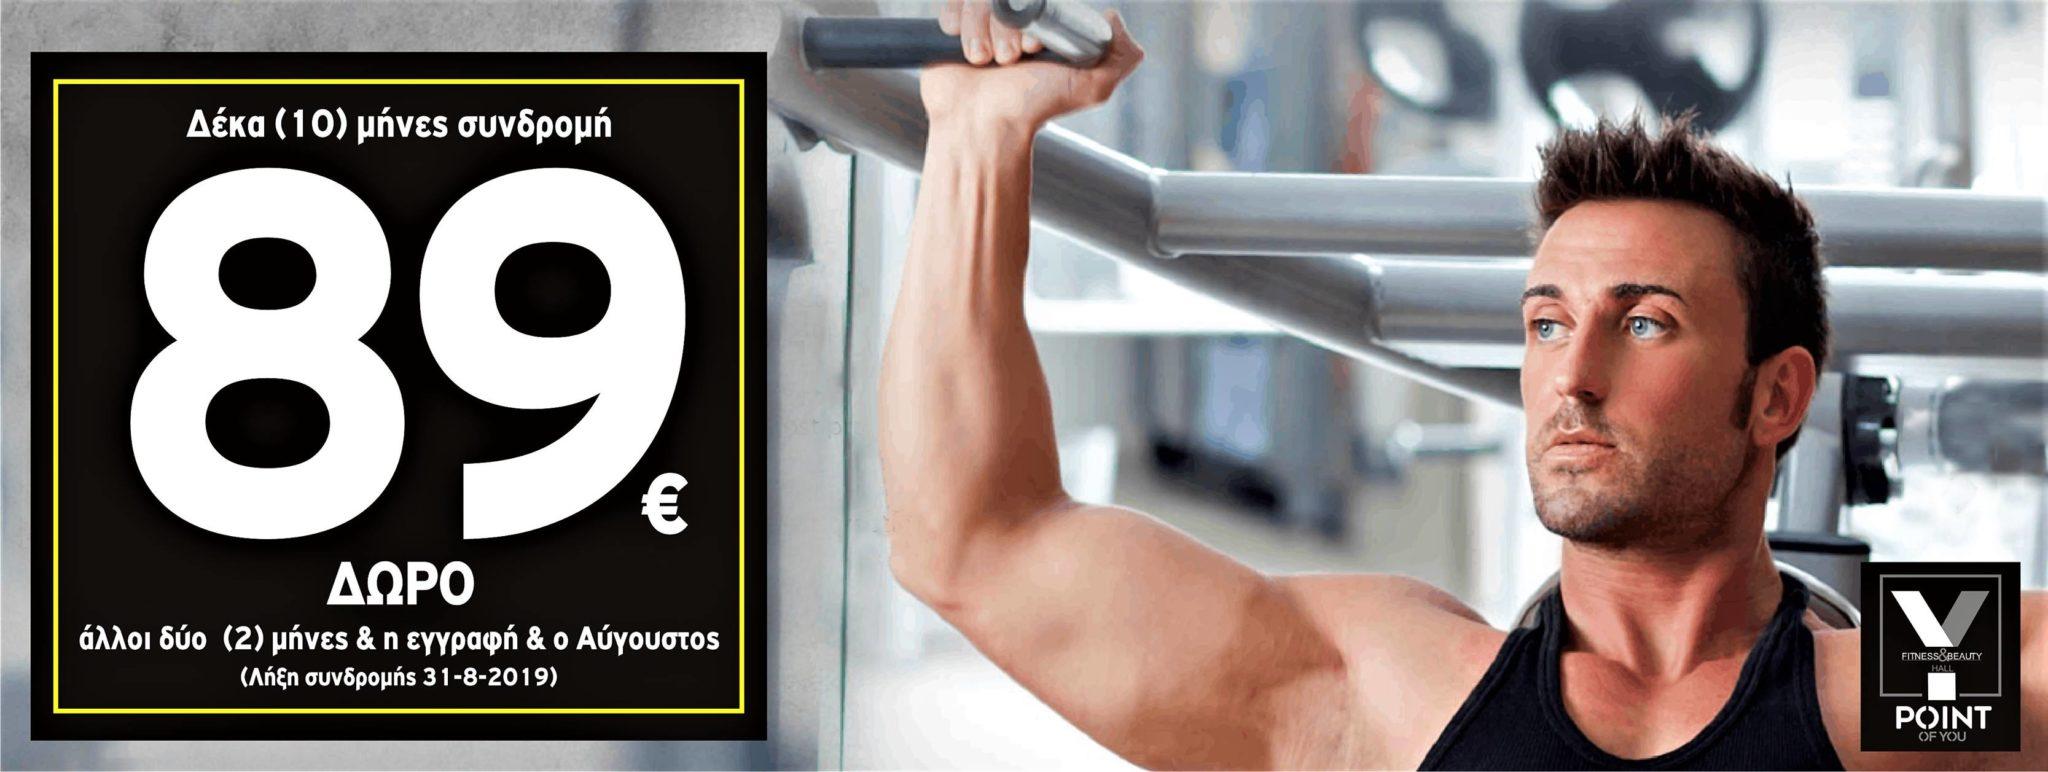 point-of-you-offer-sportshunter.gr